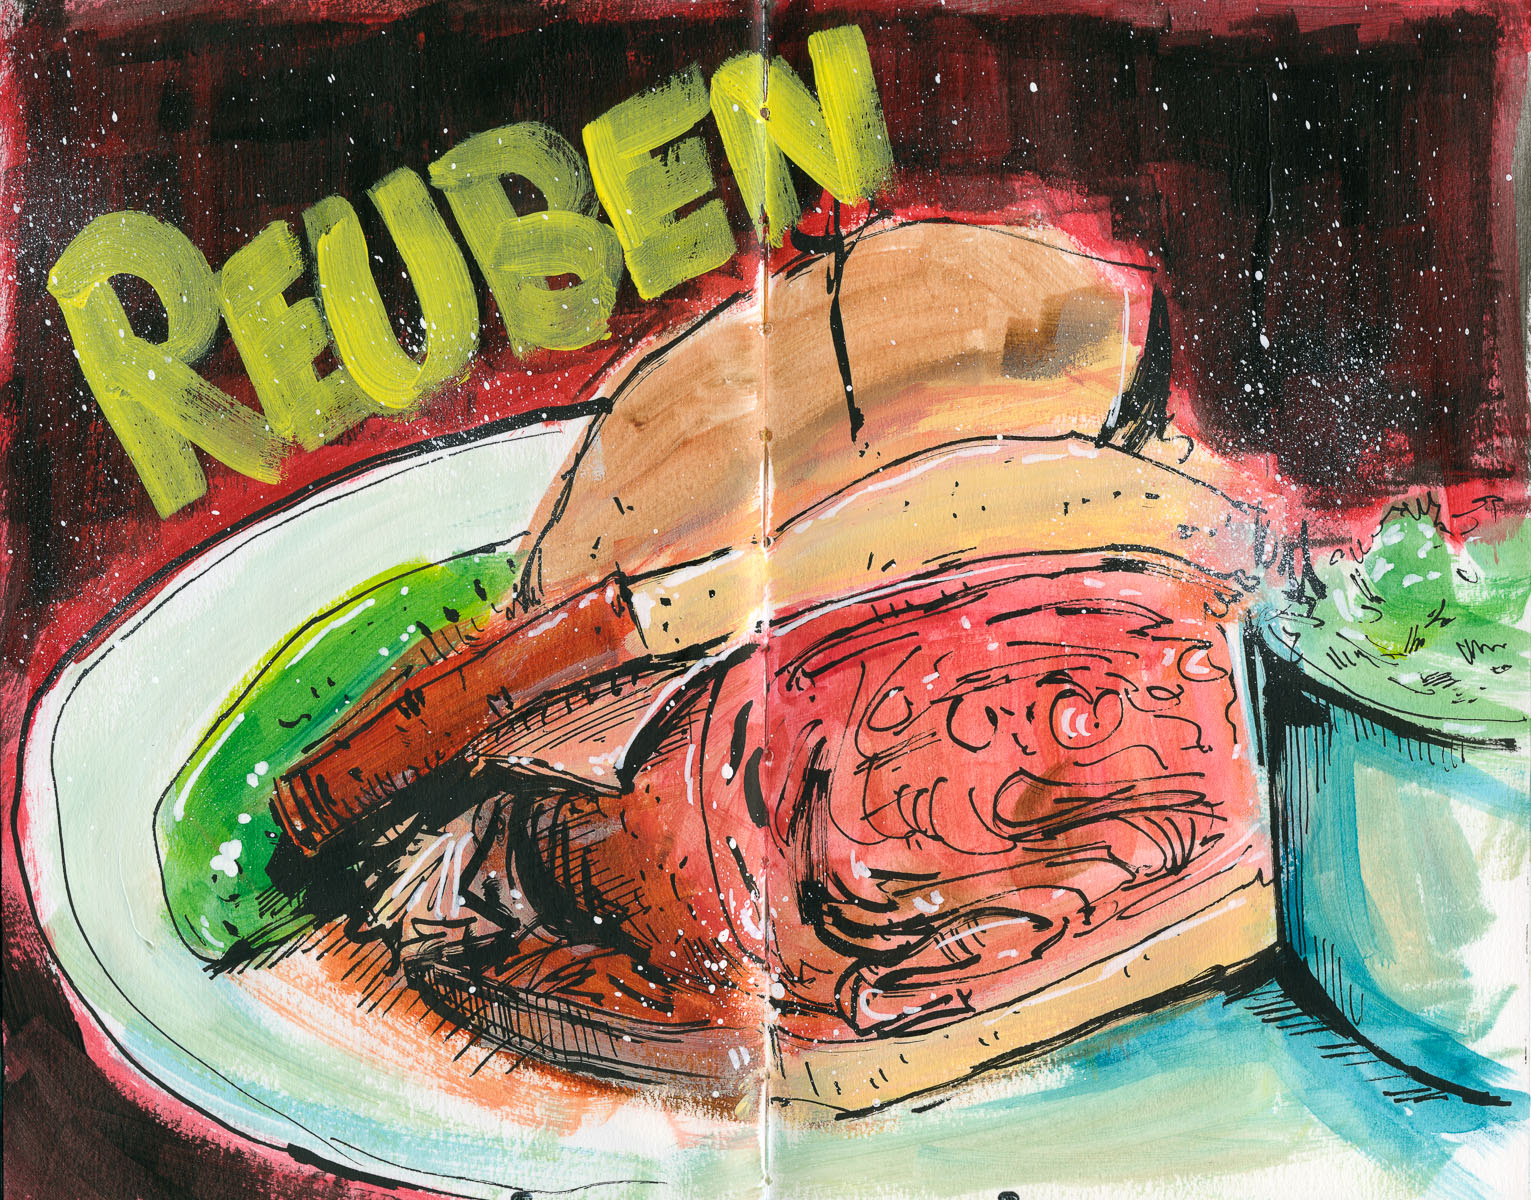 Cannon Pearson–Sketchbook: Reuben